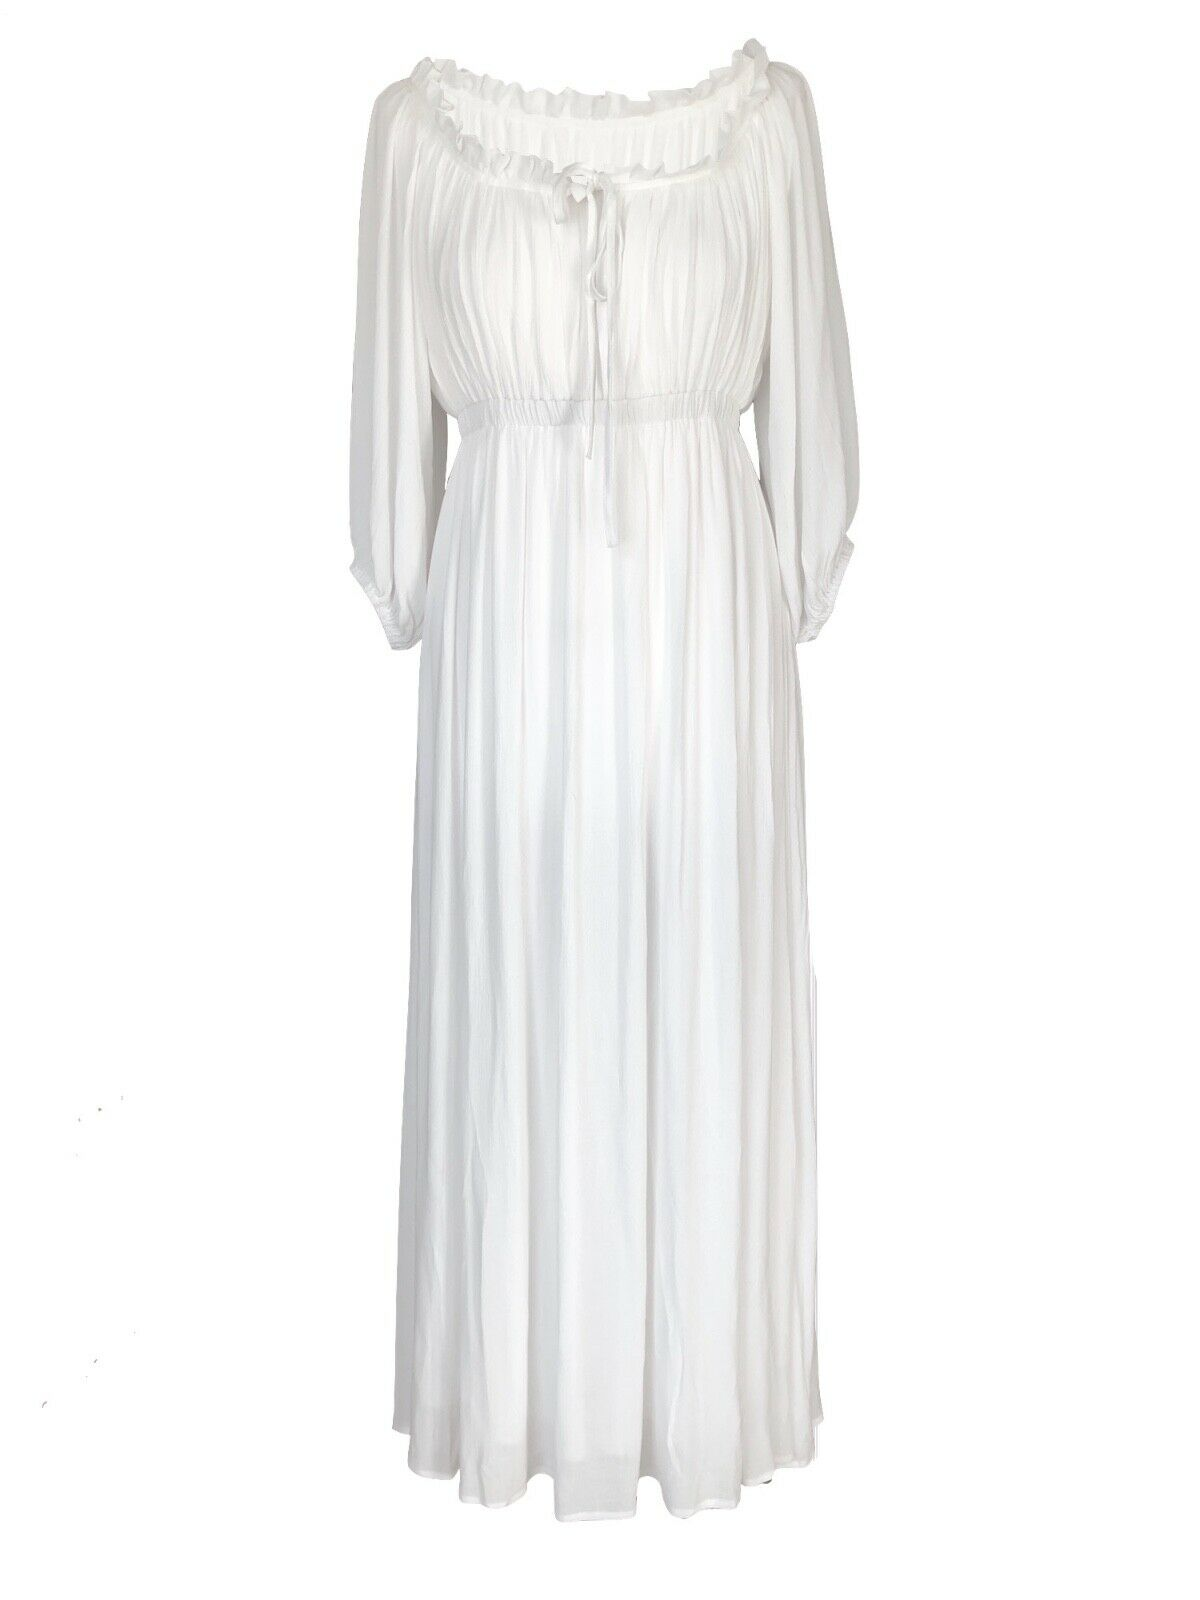 Off Weiß lungo Boho Peasant Jane Austen Regency Gypsy Maxi Wedding Pirate Kleid